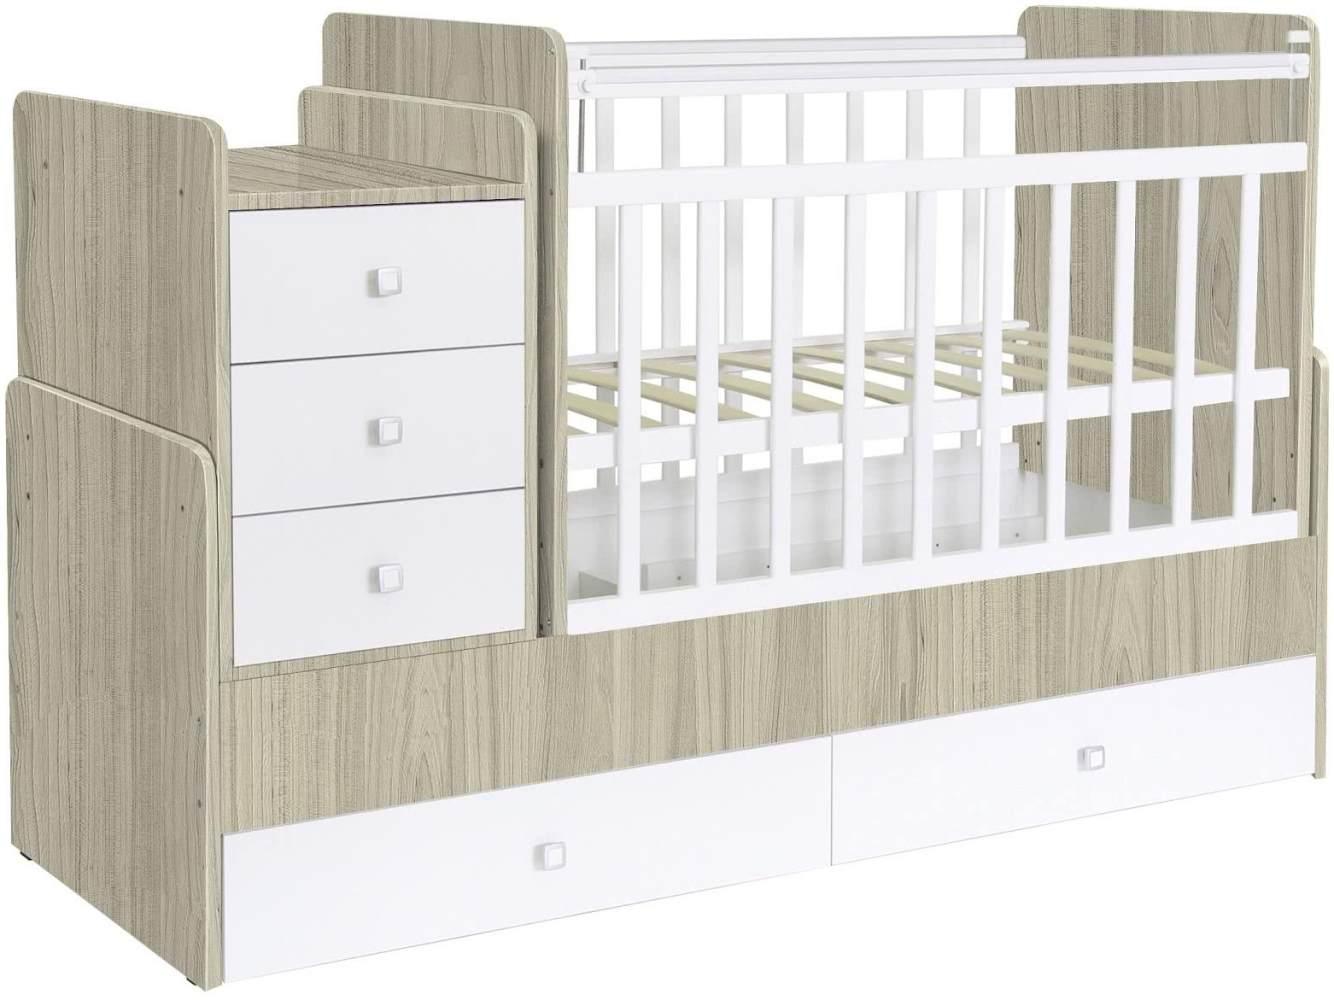 Polini Kids 'Simple 1100' Kombi-Kinderbett 60 x 120/170 cm, ulme/weiß, höhenverstellbar, mit Schaukelfunktion, inkl. Kommode Bild 1